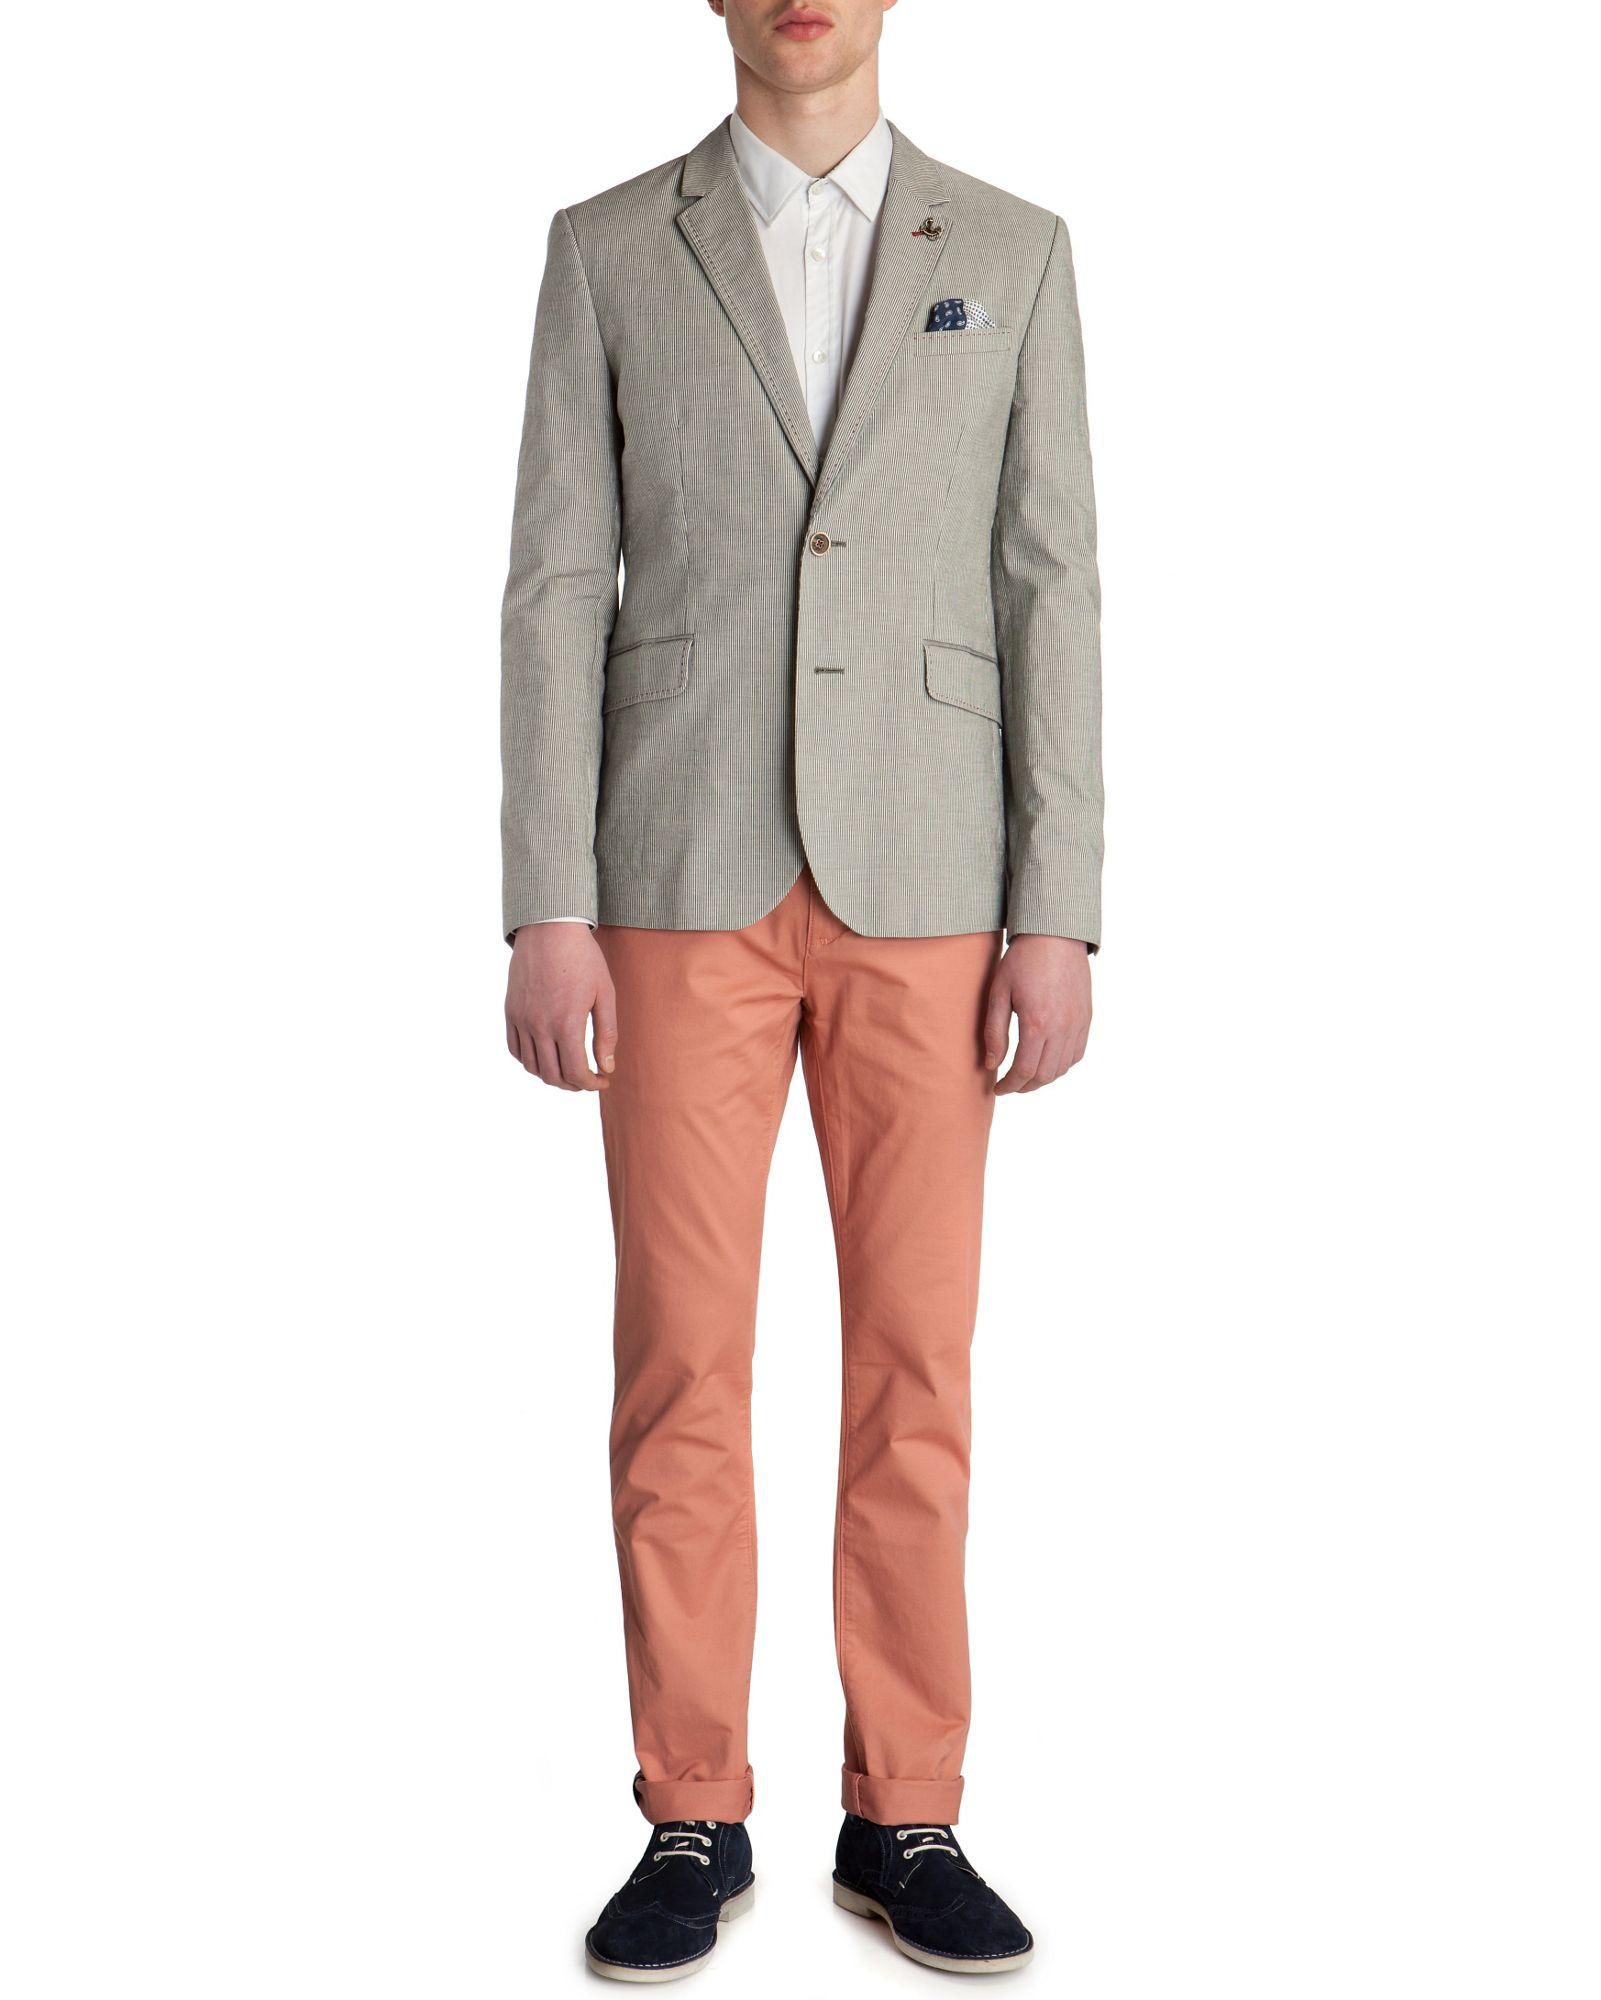 Ted Baker Carpz Single Button Blazer in Grey (Grey) for Men